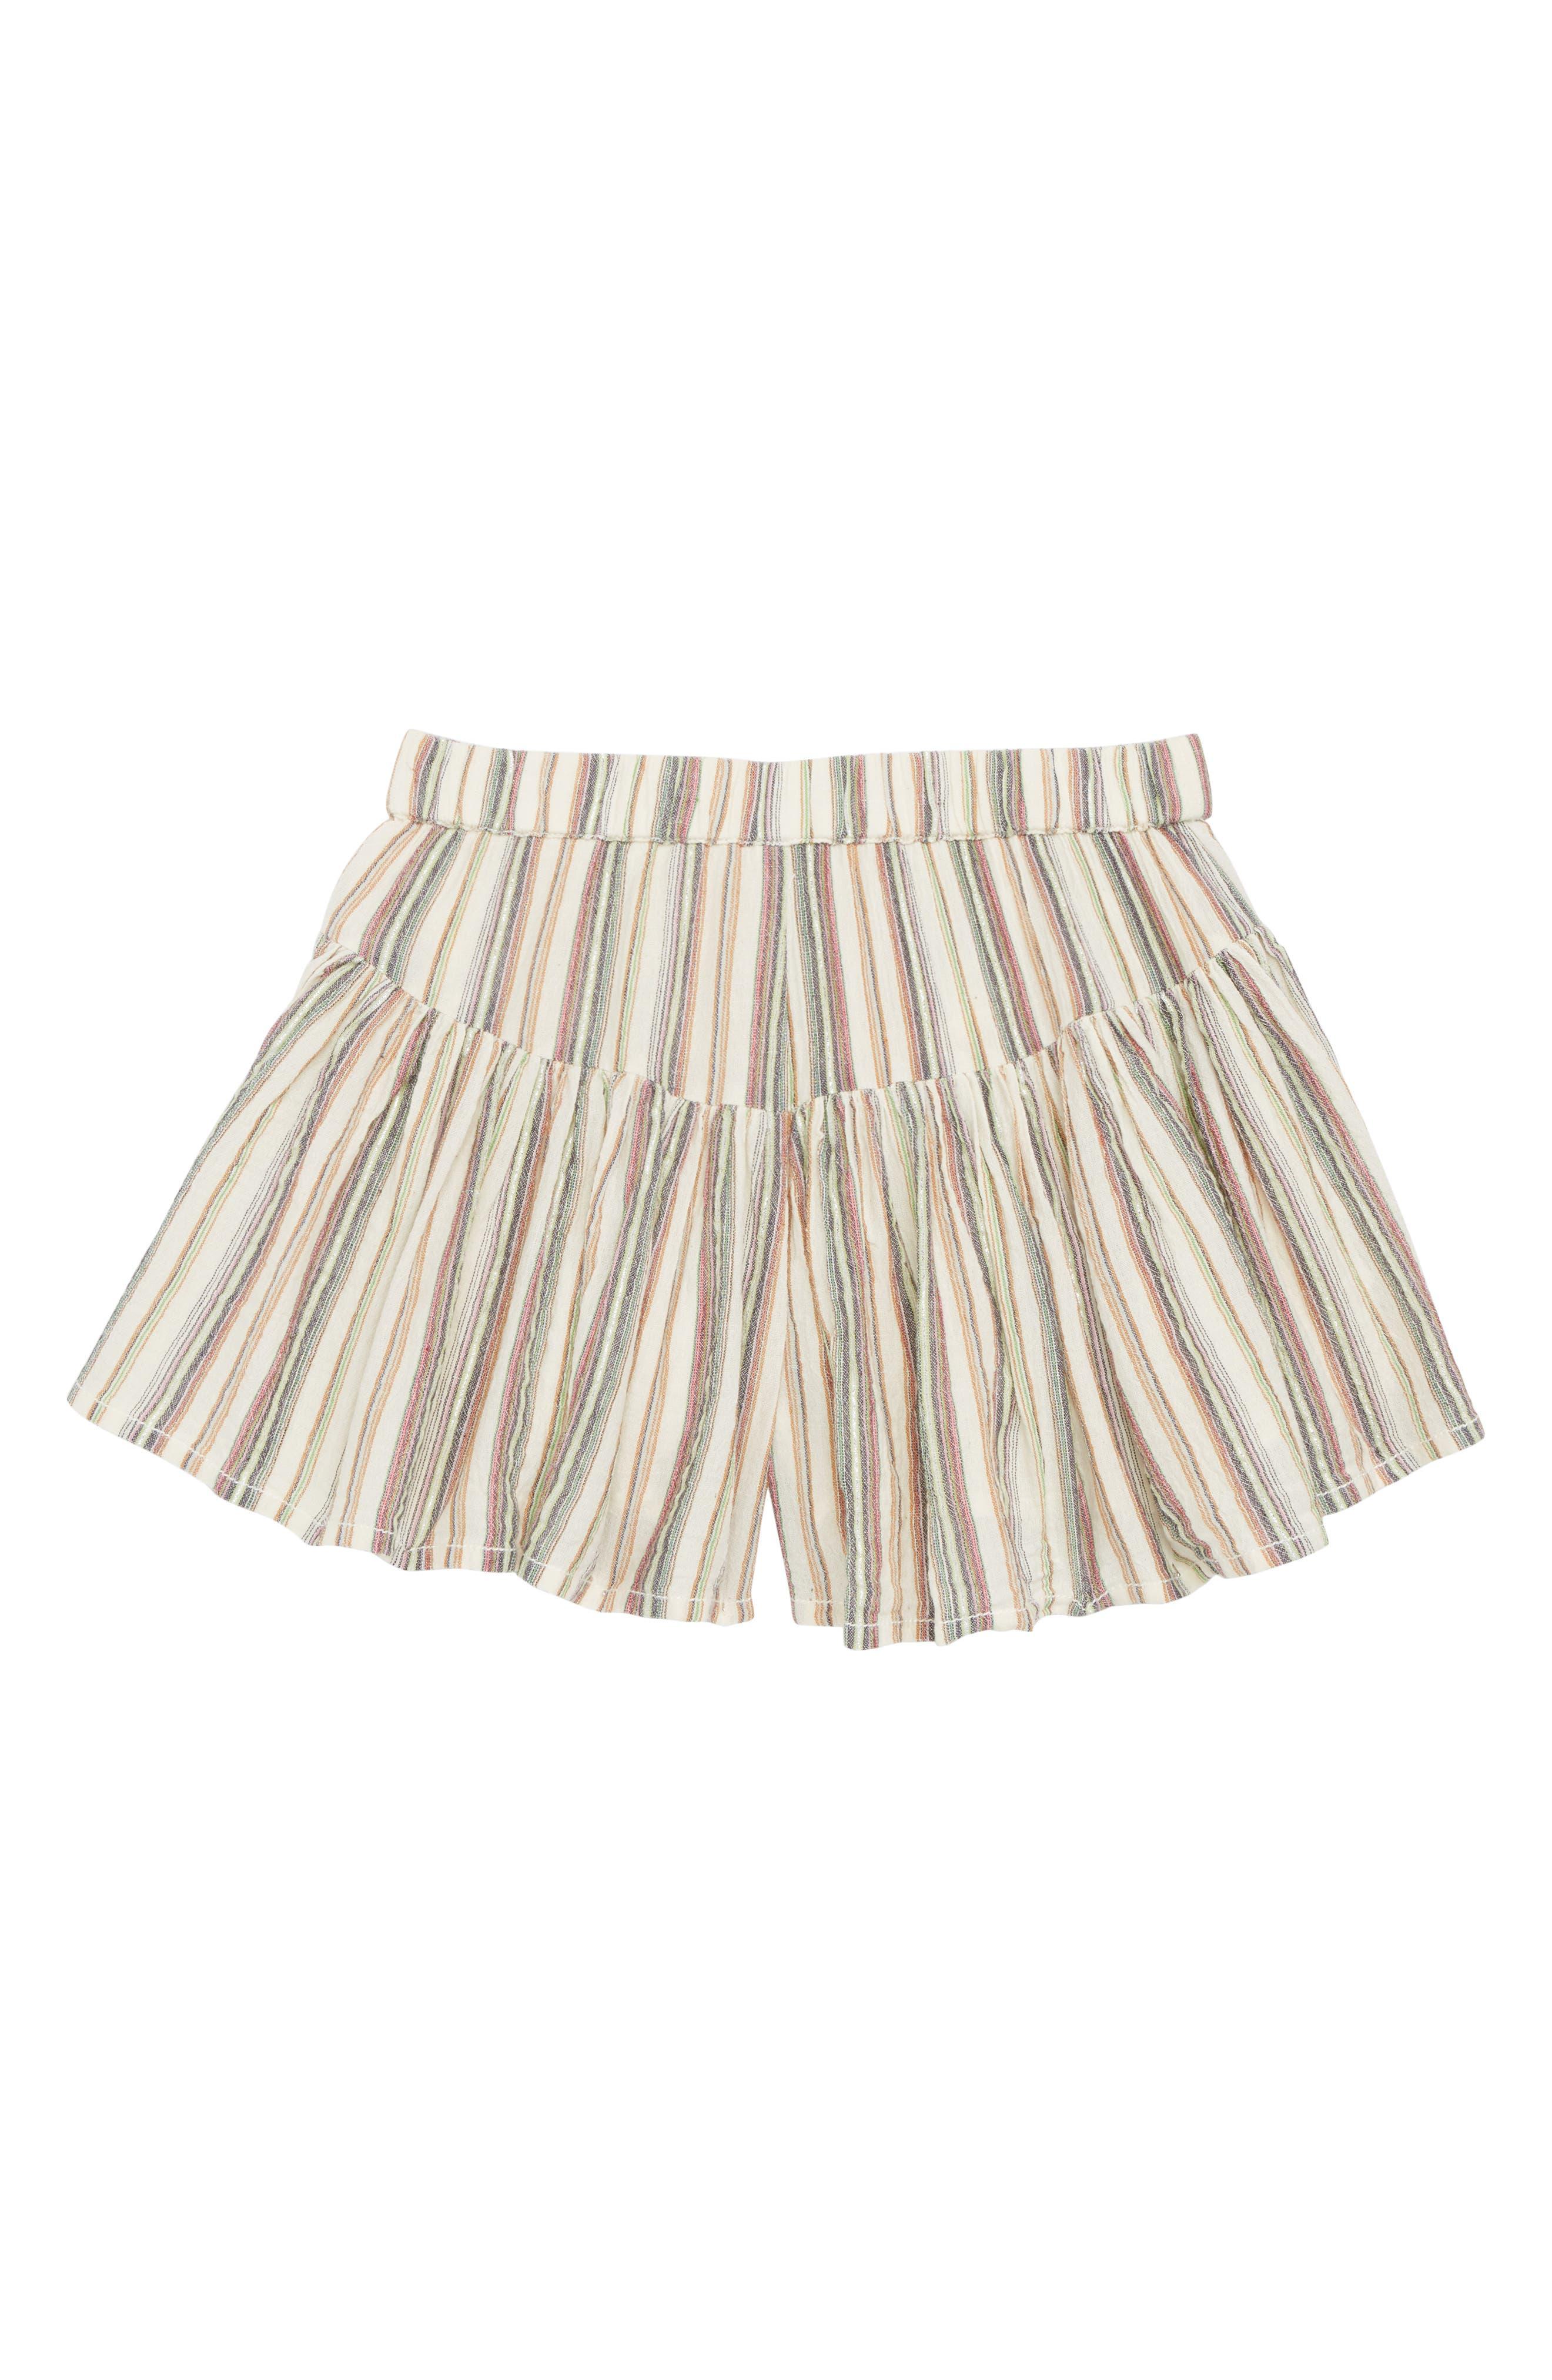 PEEK AREN'T YOU CURIOUS Peek Nora Stripe Shorts, Main, color, 900